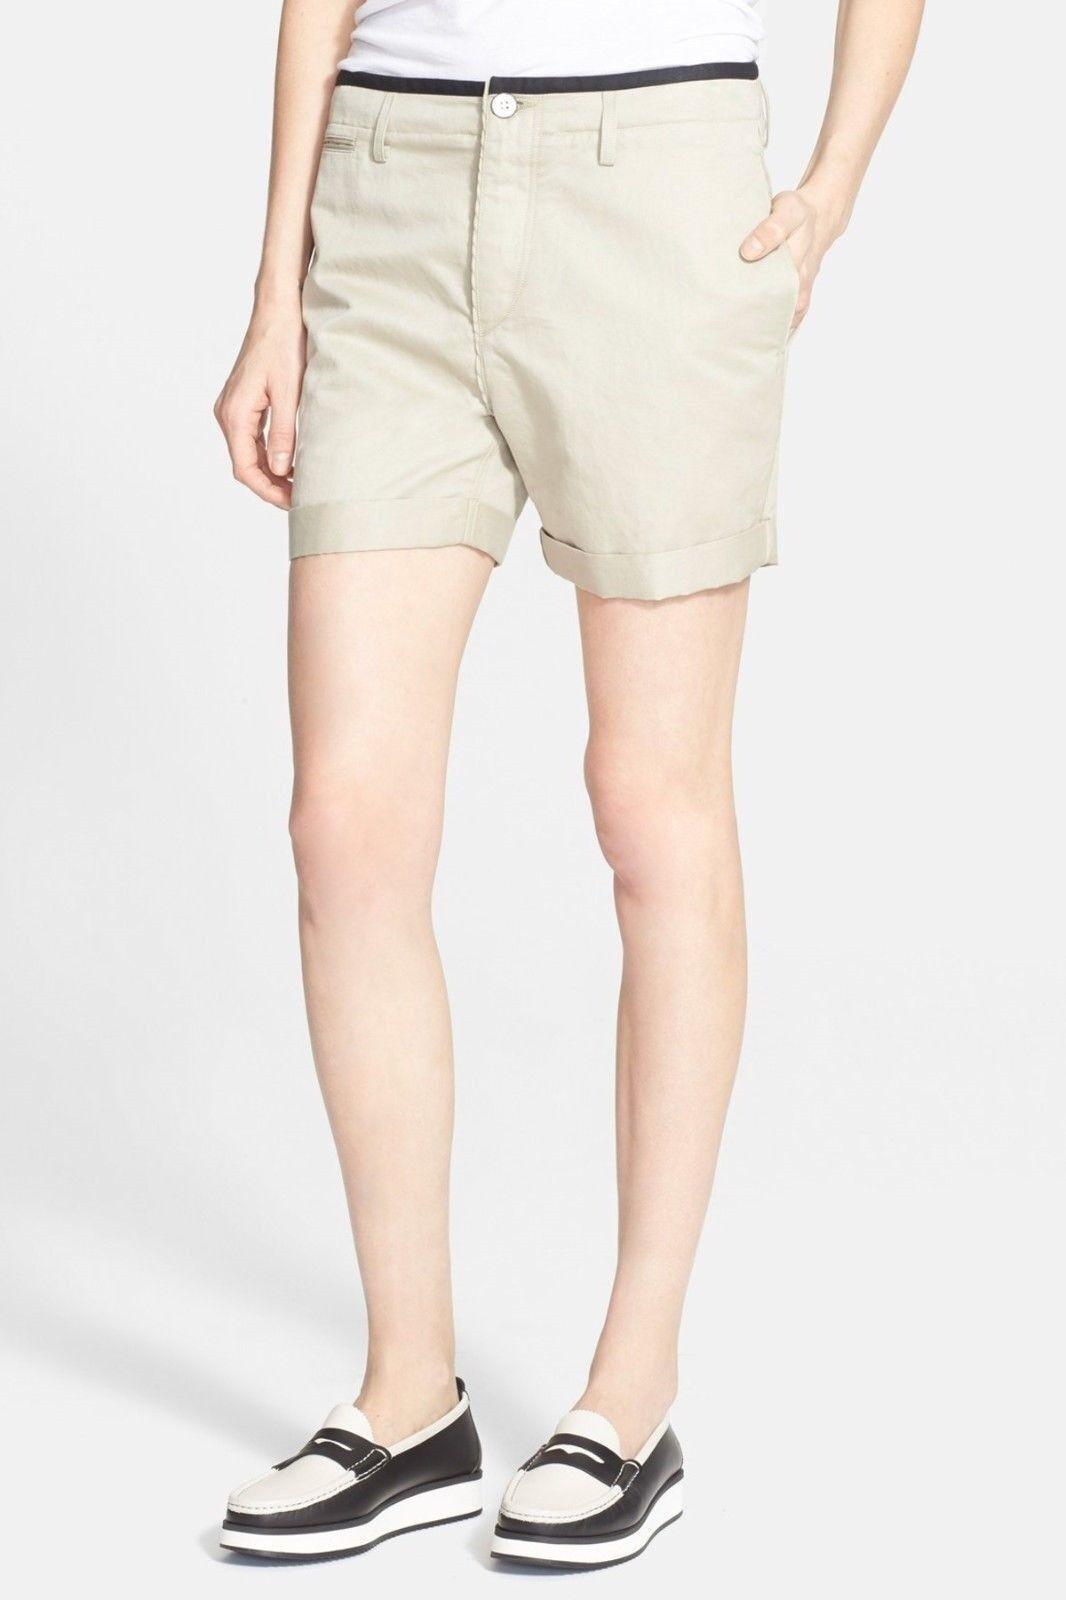 Rag & Bone Ashbury Boyfriend Linen Blend Beige Shorts 0